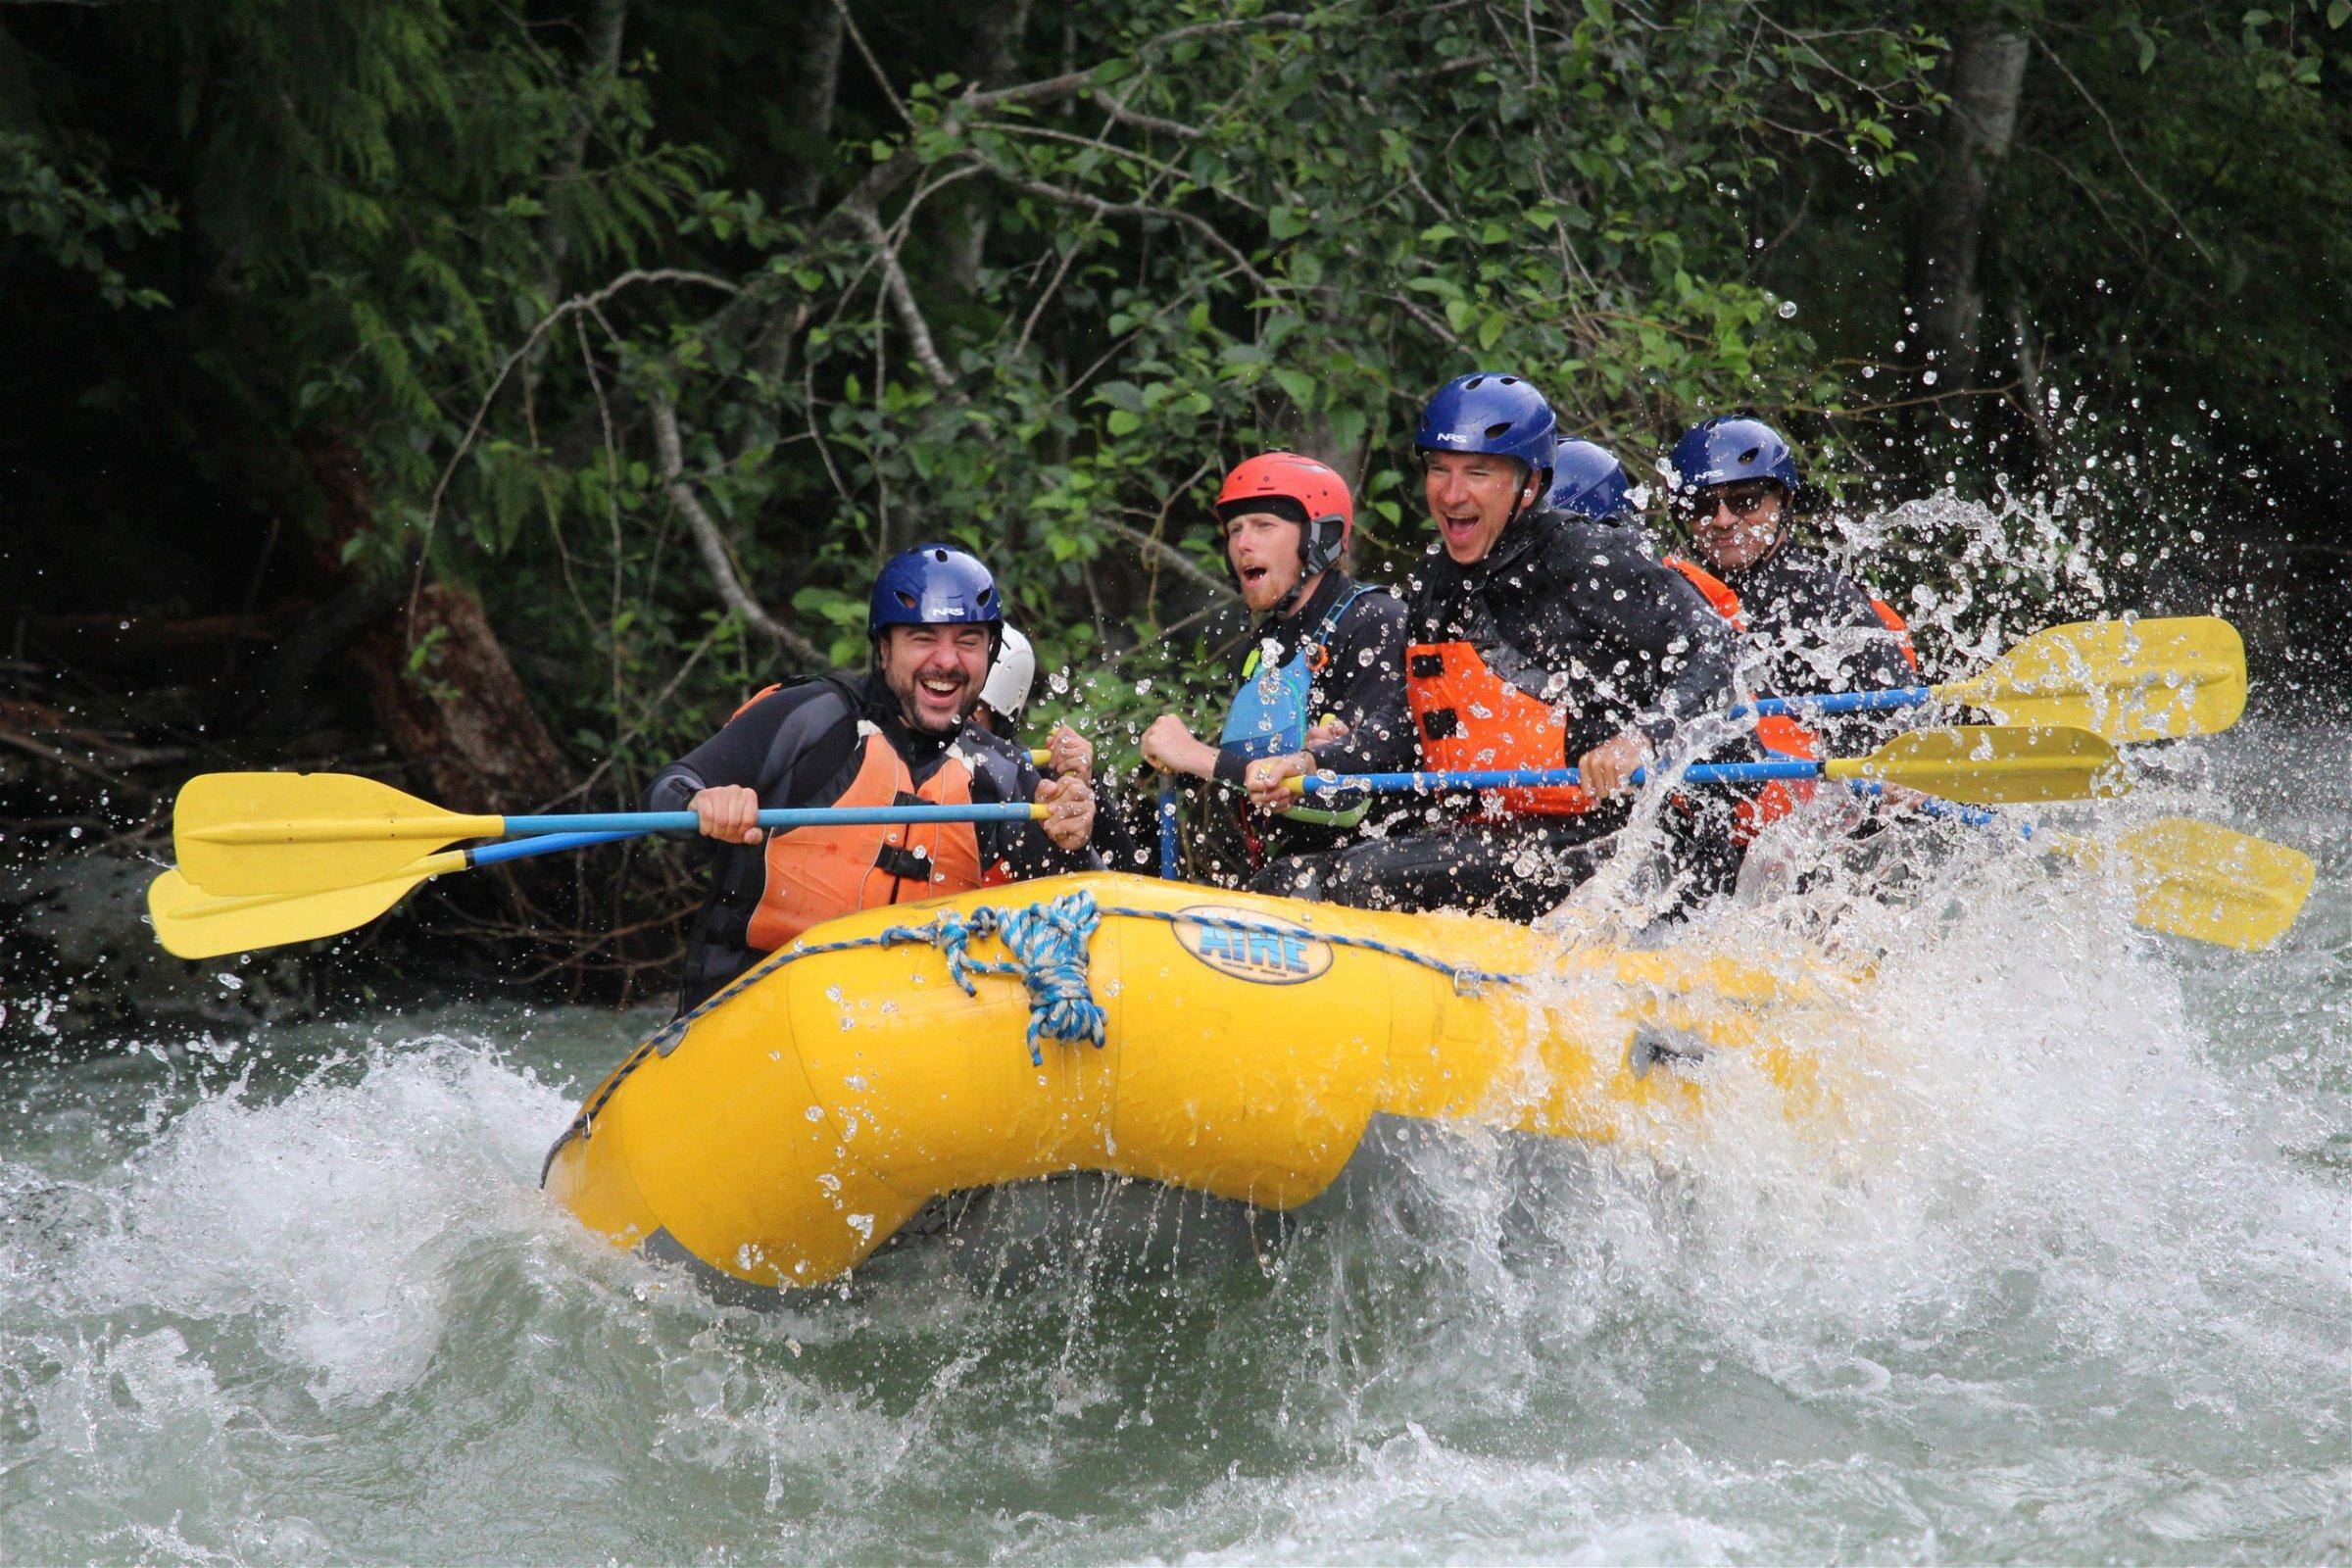 Summer Rafting in Squamish